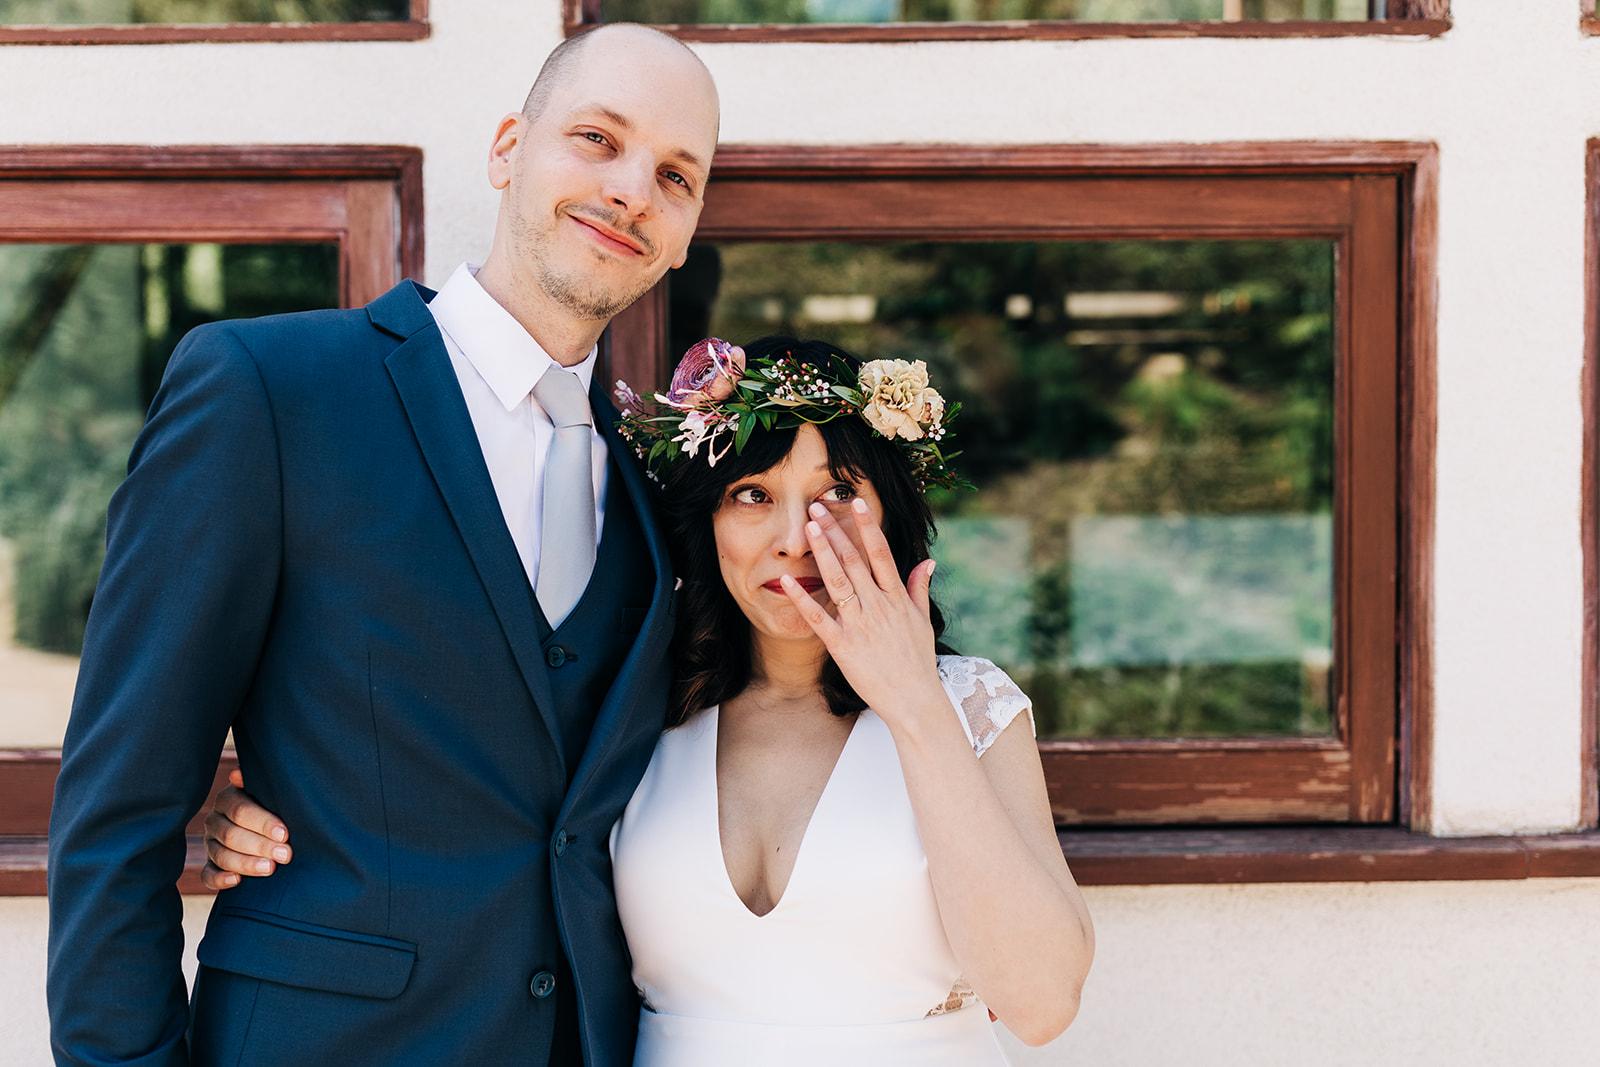 Bride wipes away happy tears